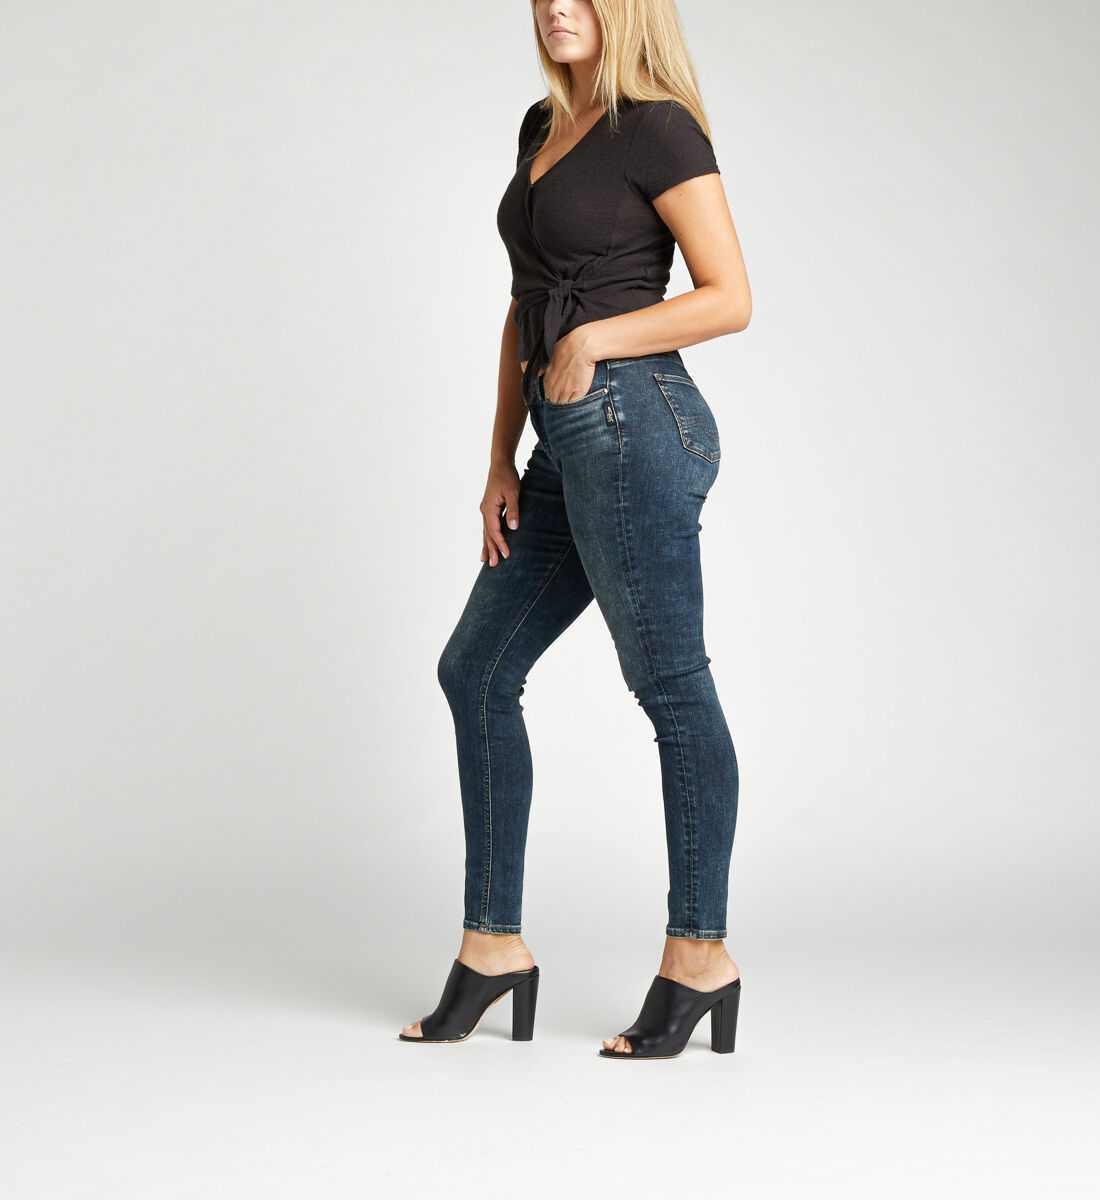 Elyse Mid Rise Skinny Jeans Side